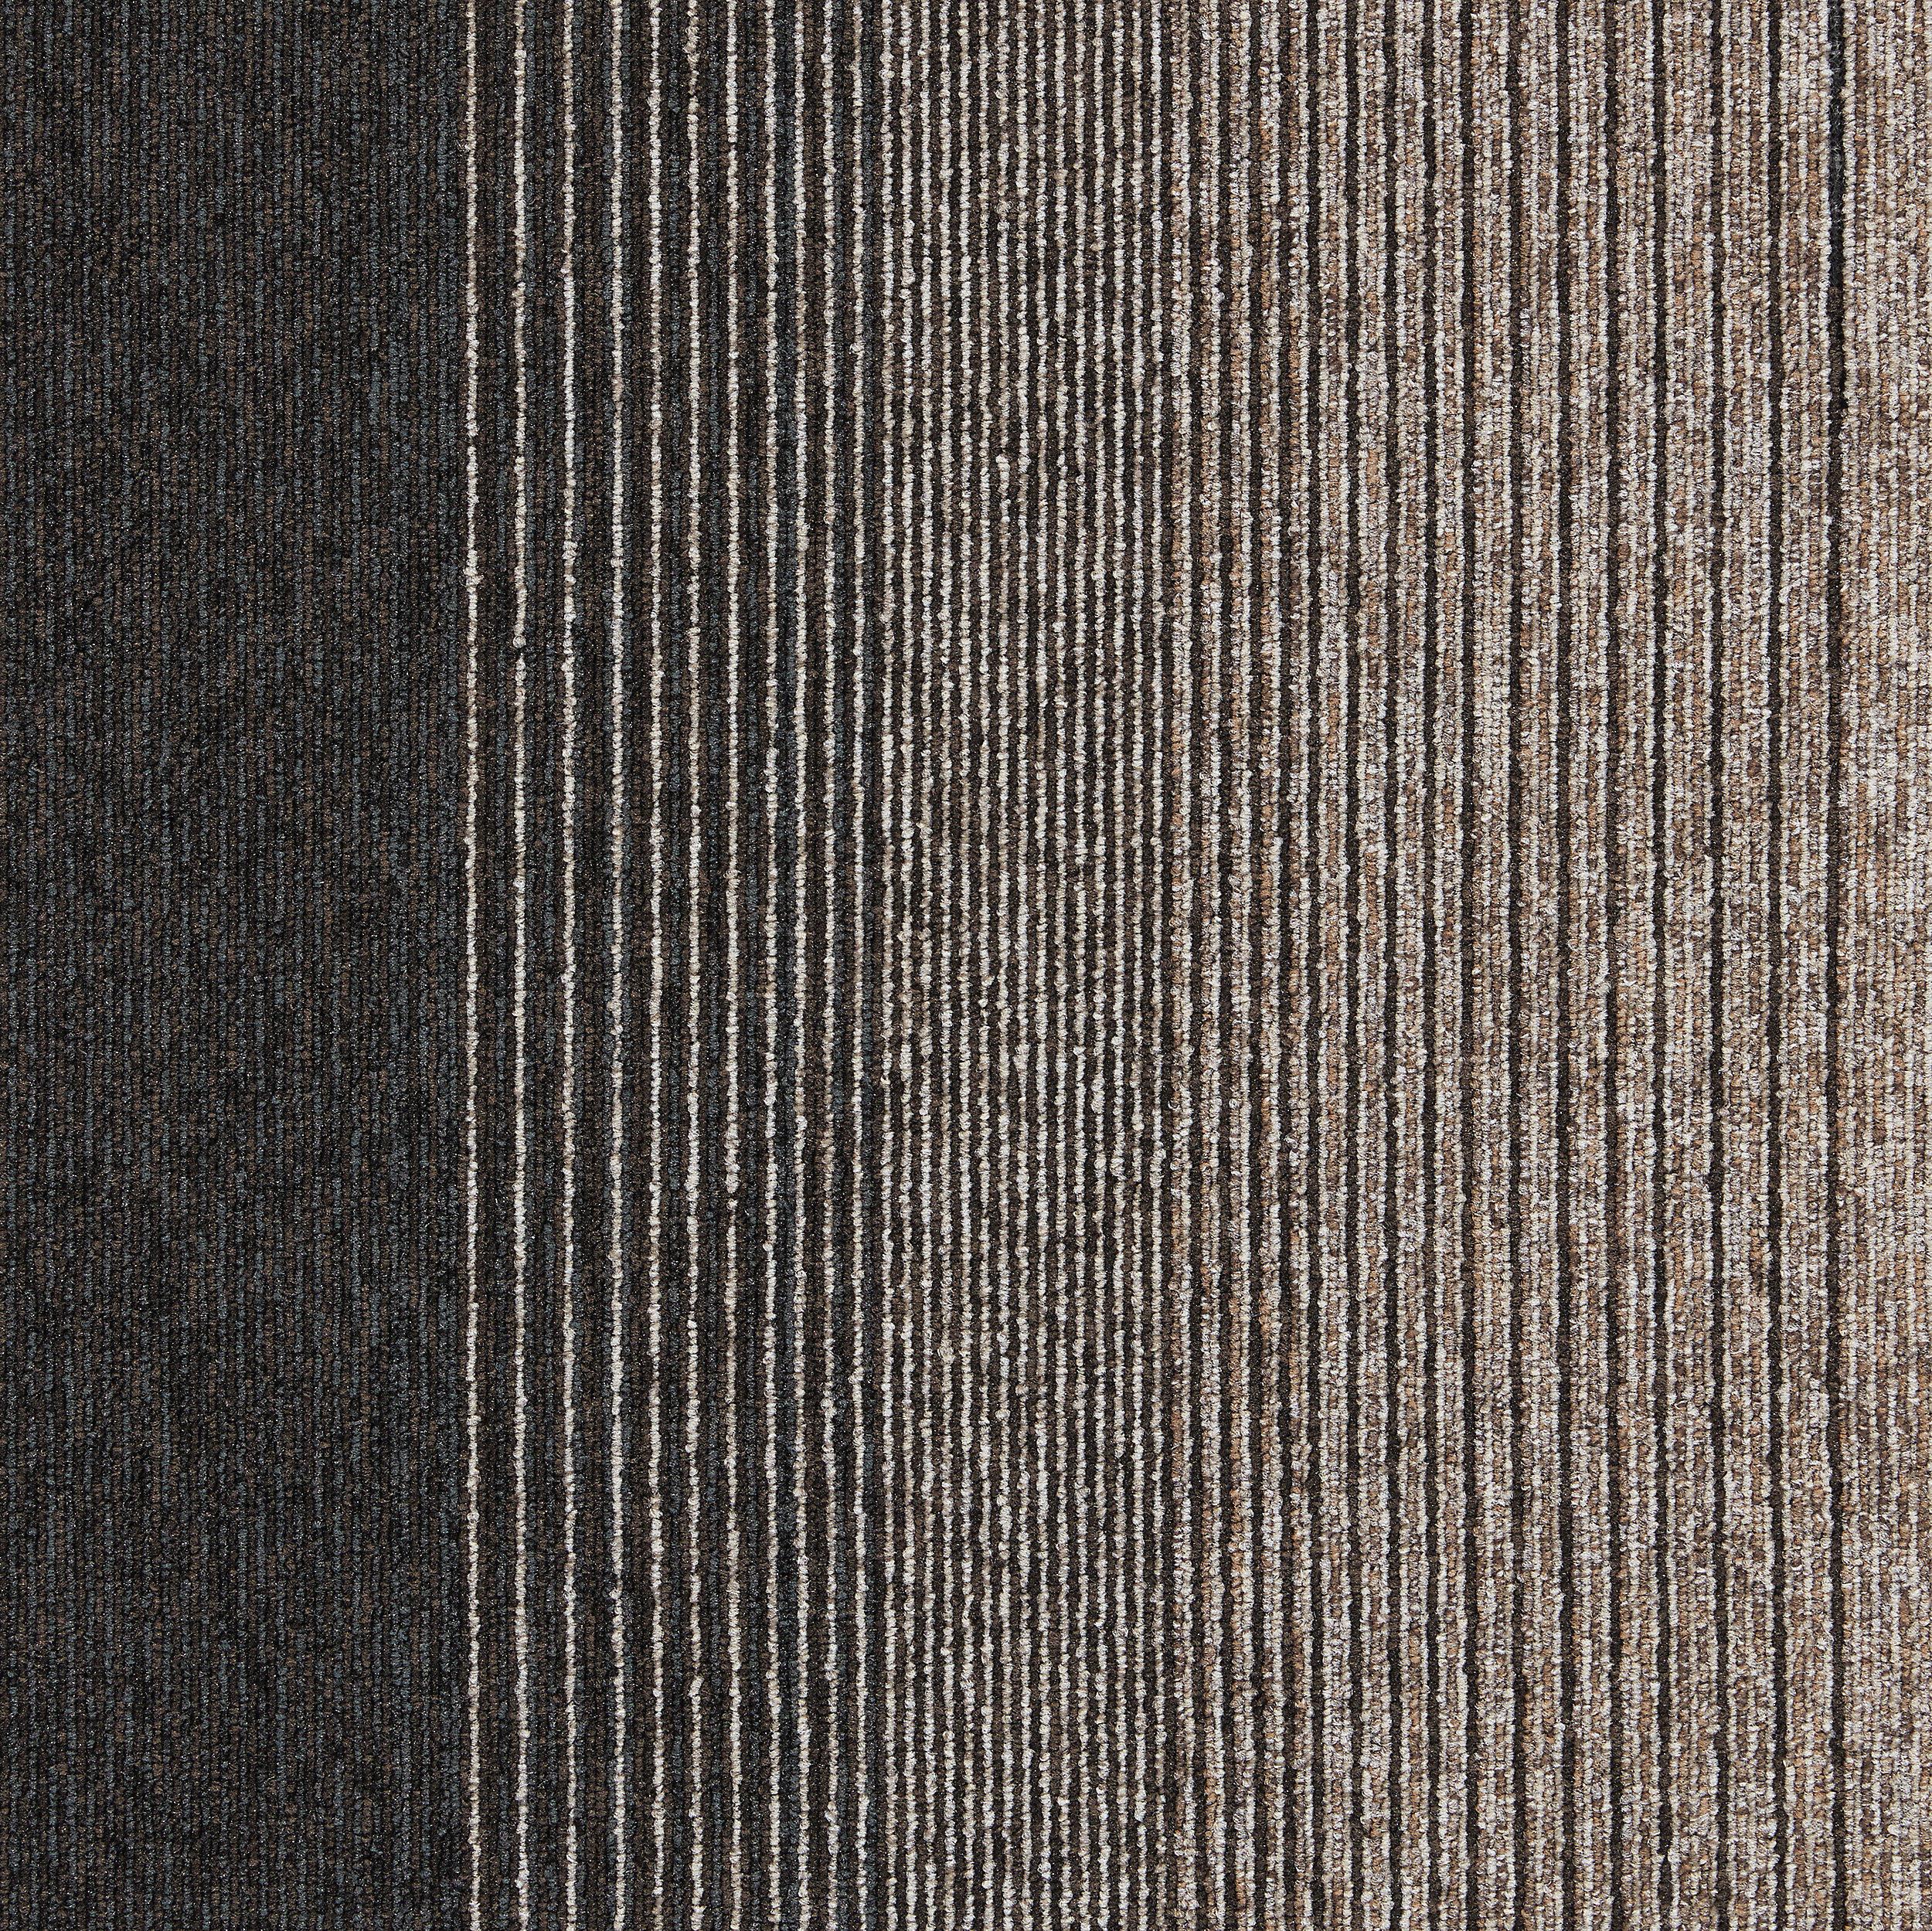 Employ lines 4223001 harvest carpet tiles from interface employ lines 4223001 harvest by interface carpet tiles baanklon Gallery